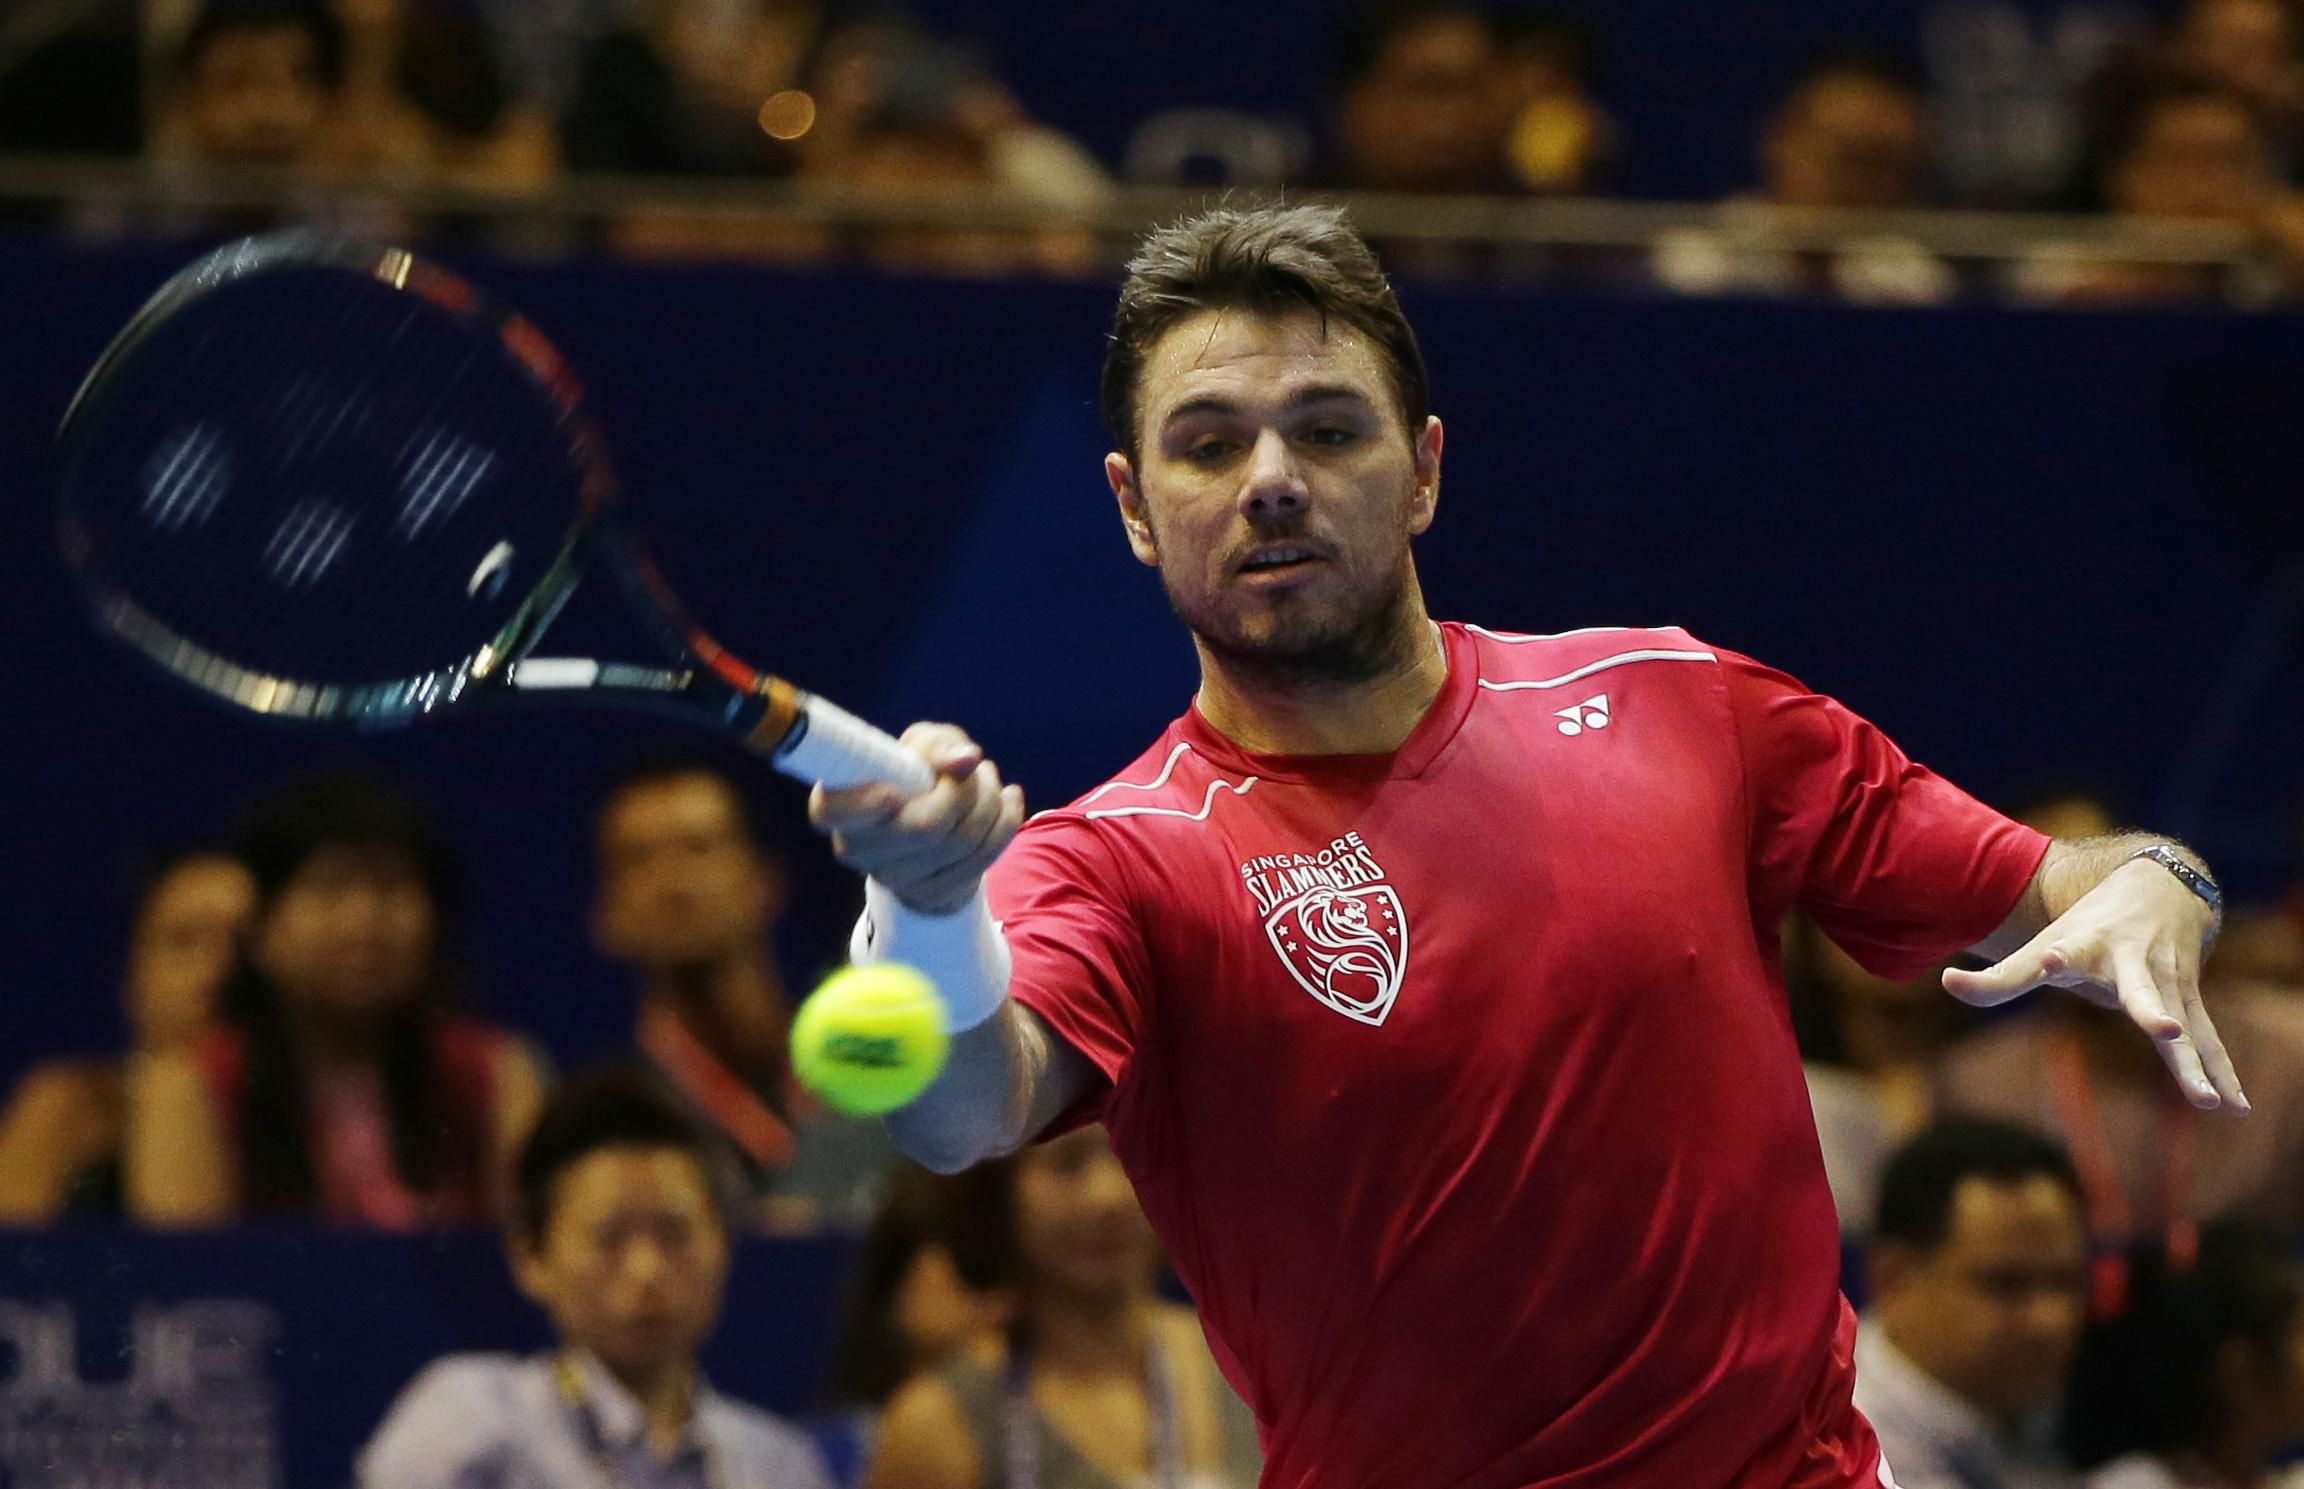 International Premier Tennis League FinalnMen's Singles - Singapore Slammers' Stan Wawrinka in action on Sunday, December 20, 2015. Photo: Reuters